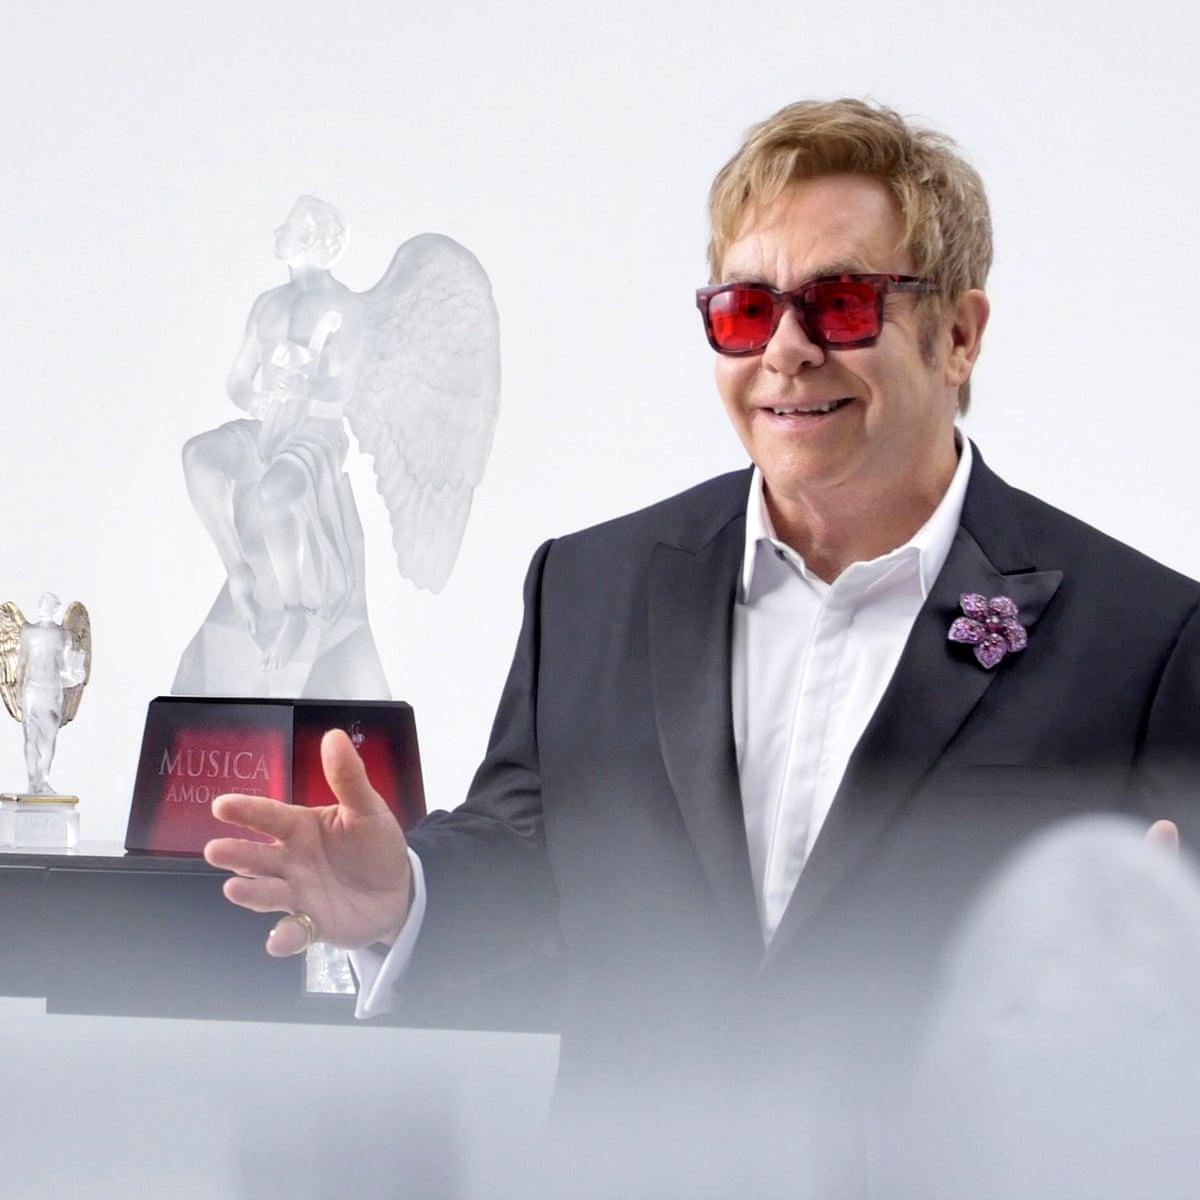 Elton John Unveils Angel Crystal Sculpture For Aids Foundation Elton John The Guardian